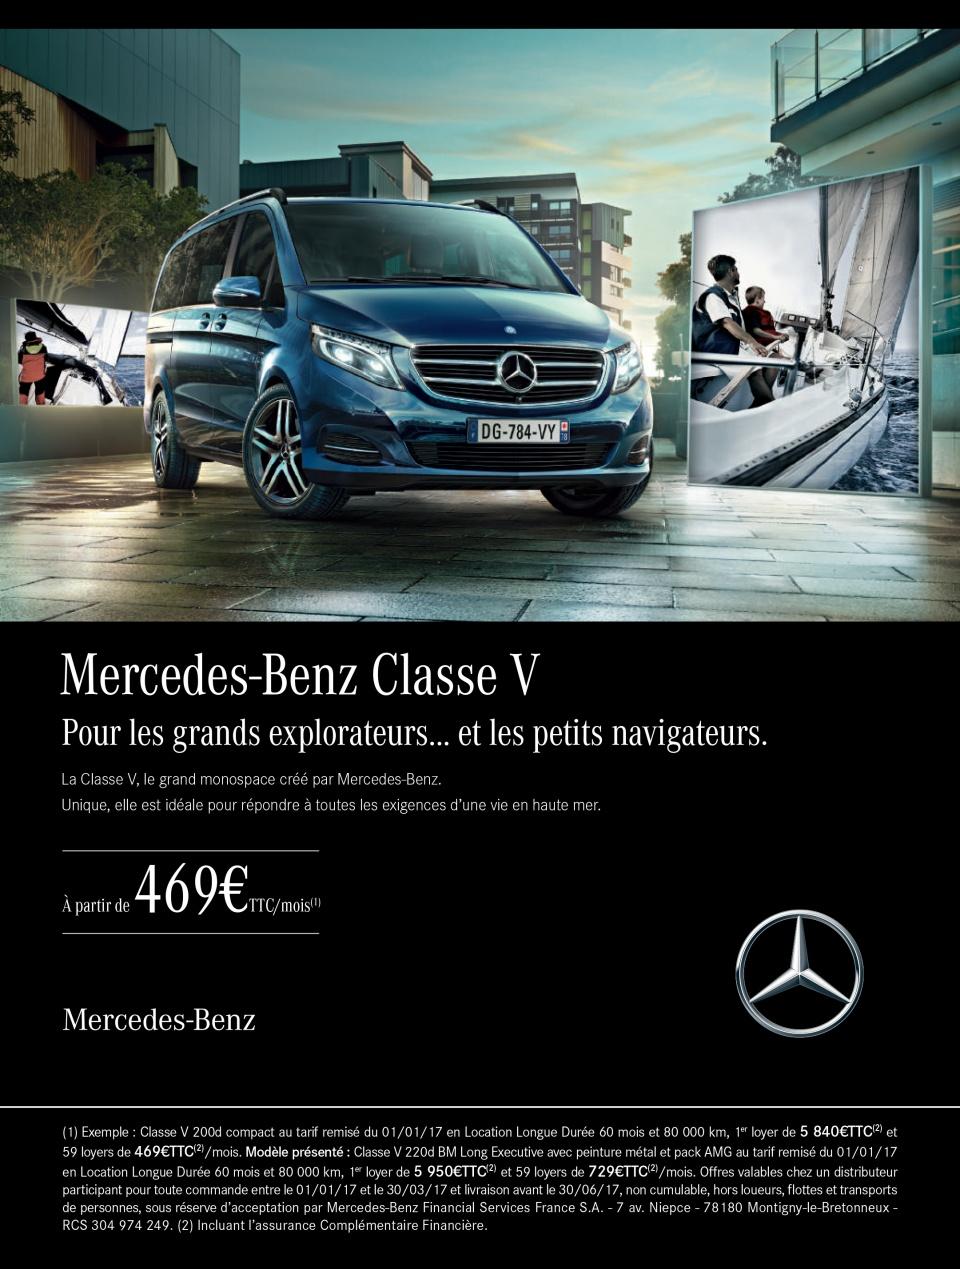 Mercedes Classe V #4